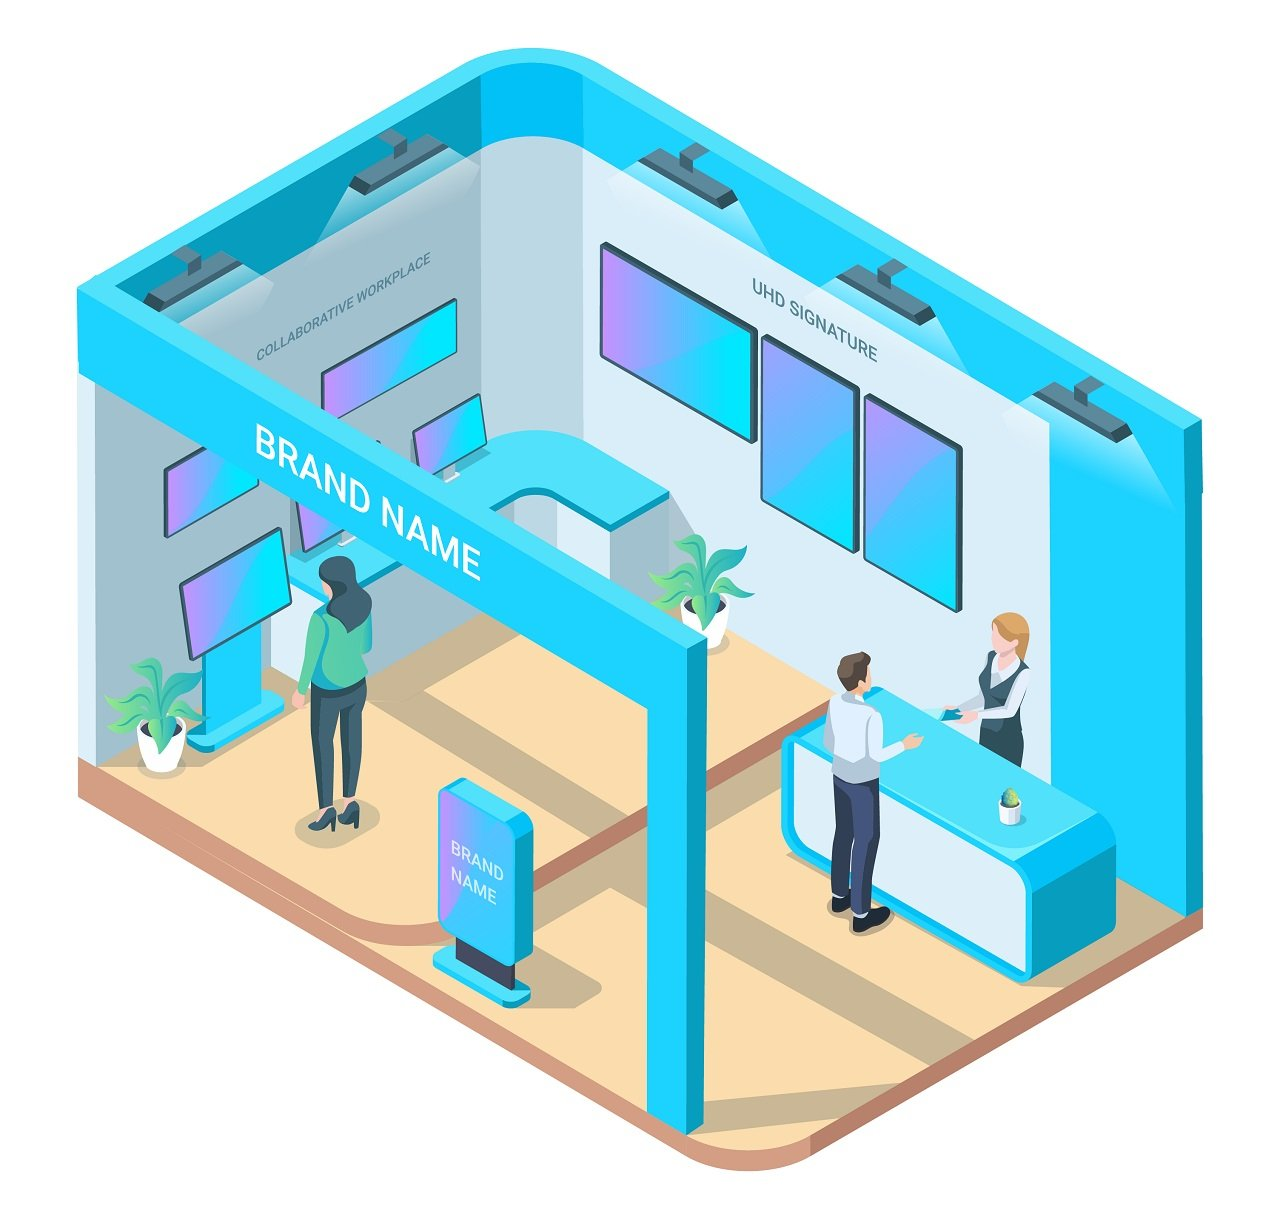 Design Agencies Digital Signage Opportunities